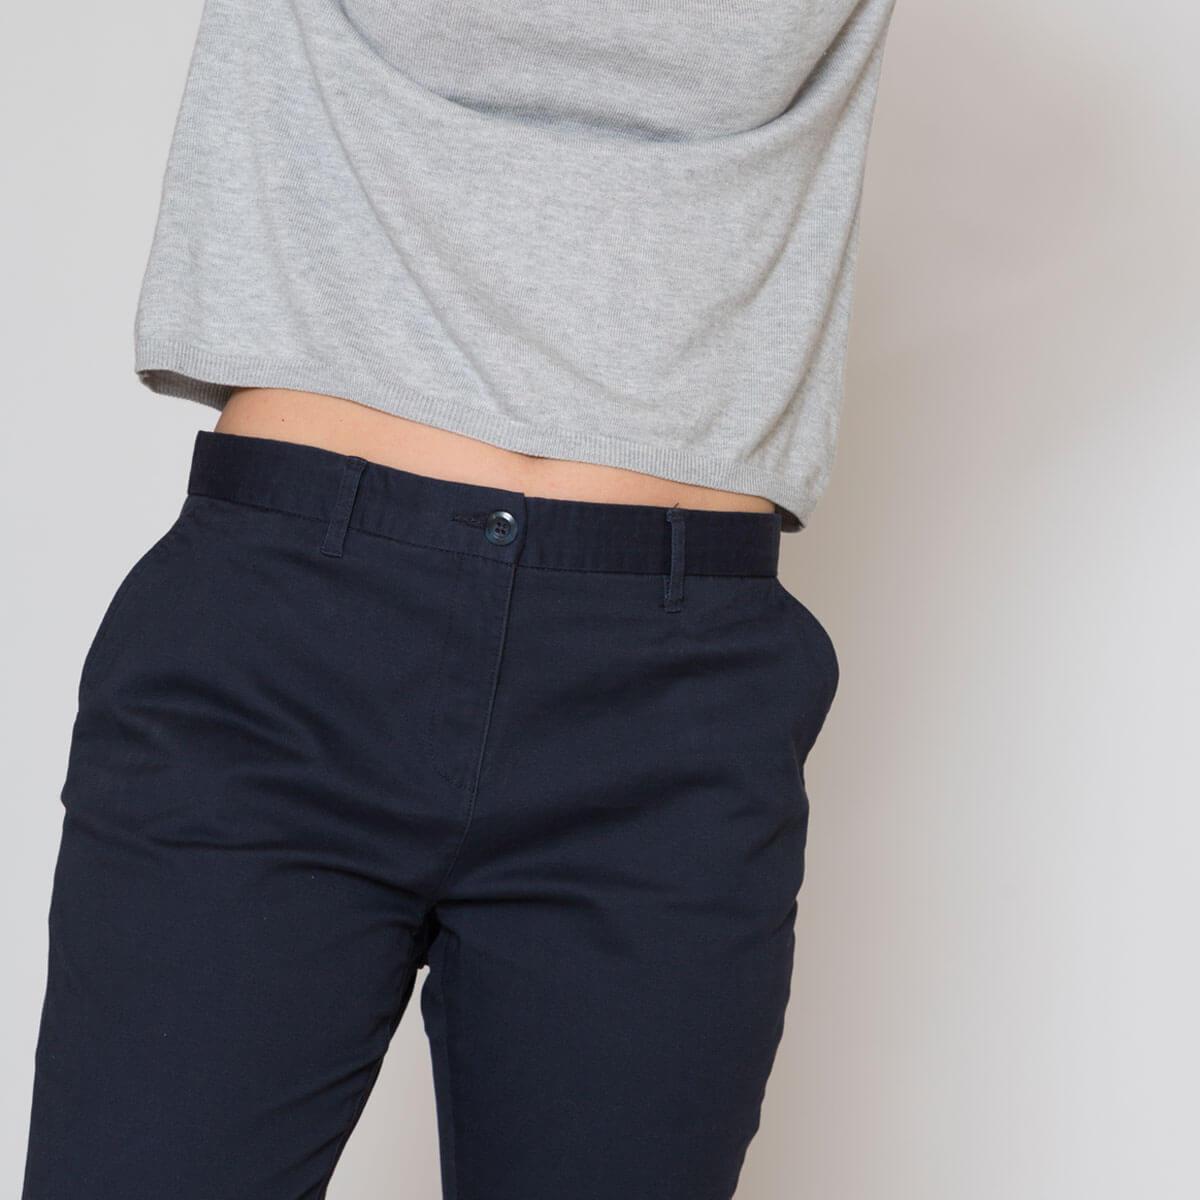 Pantalon chino femme bleu zoom